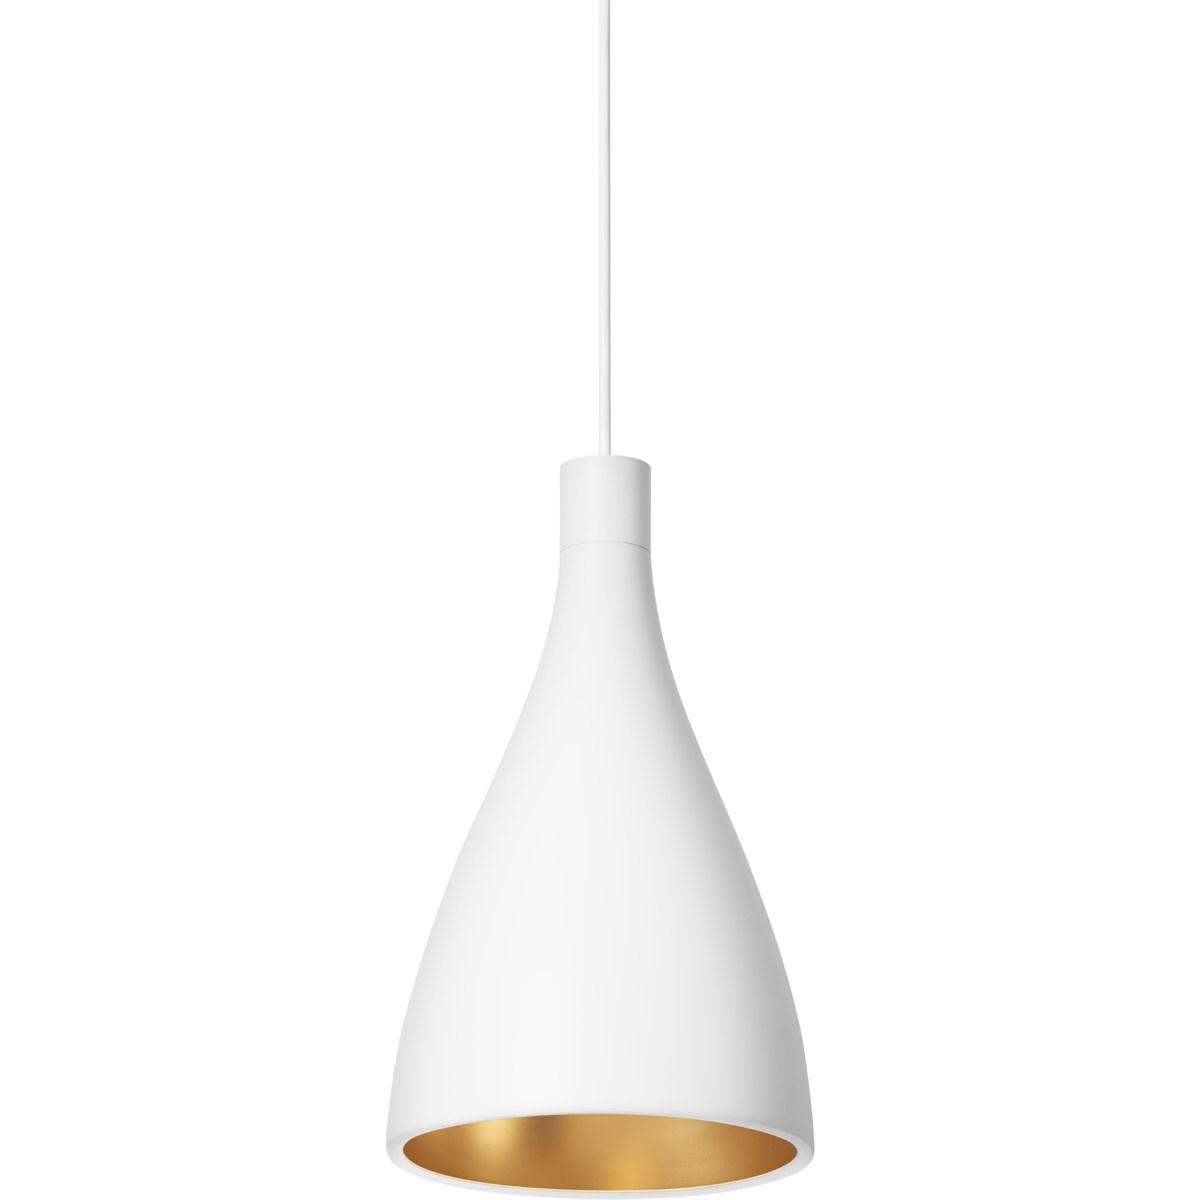 pablo swell pendants pendant fixture neenas lighting